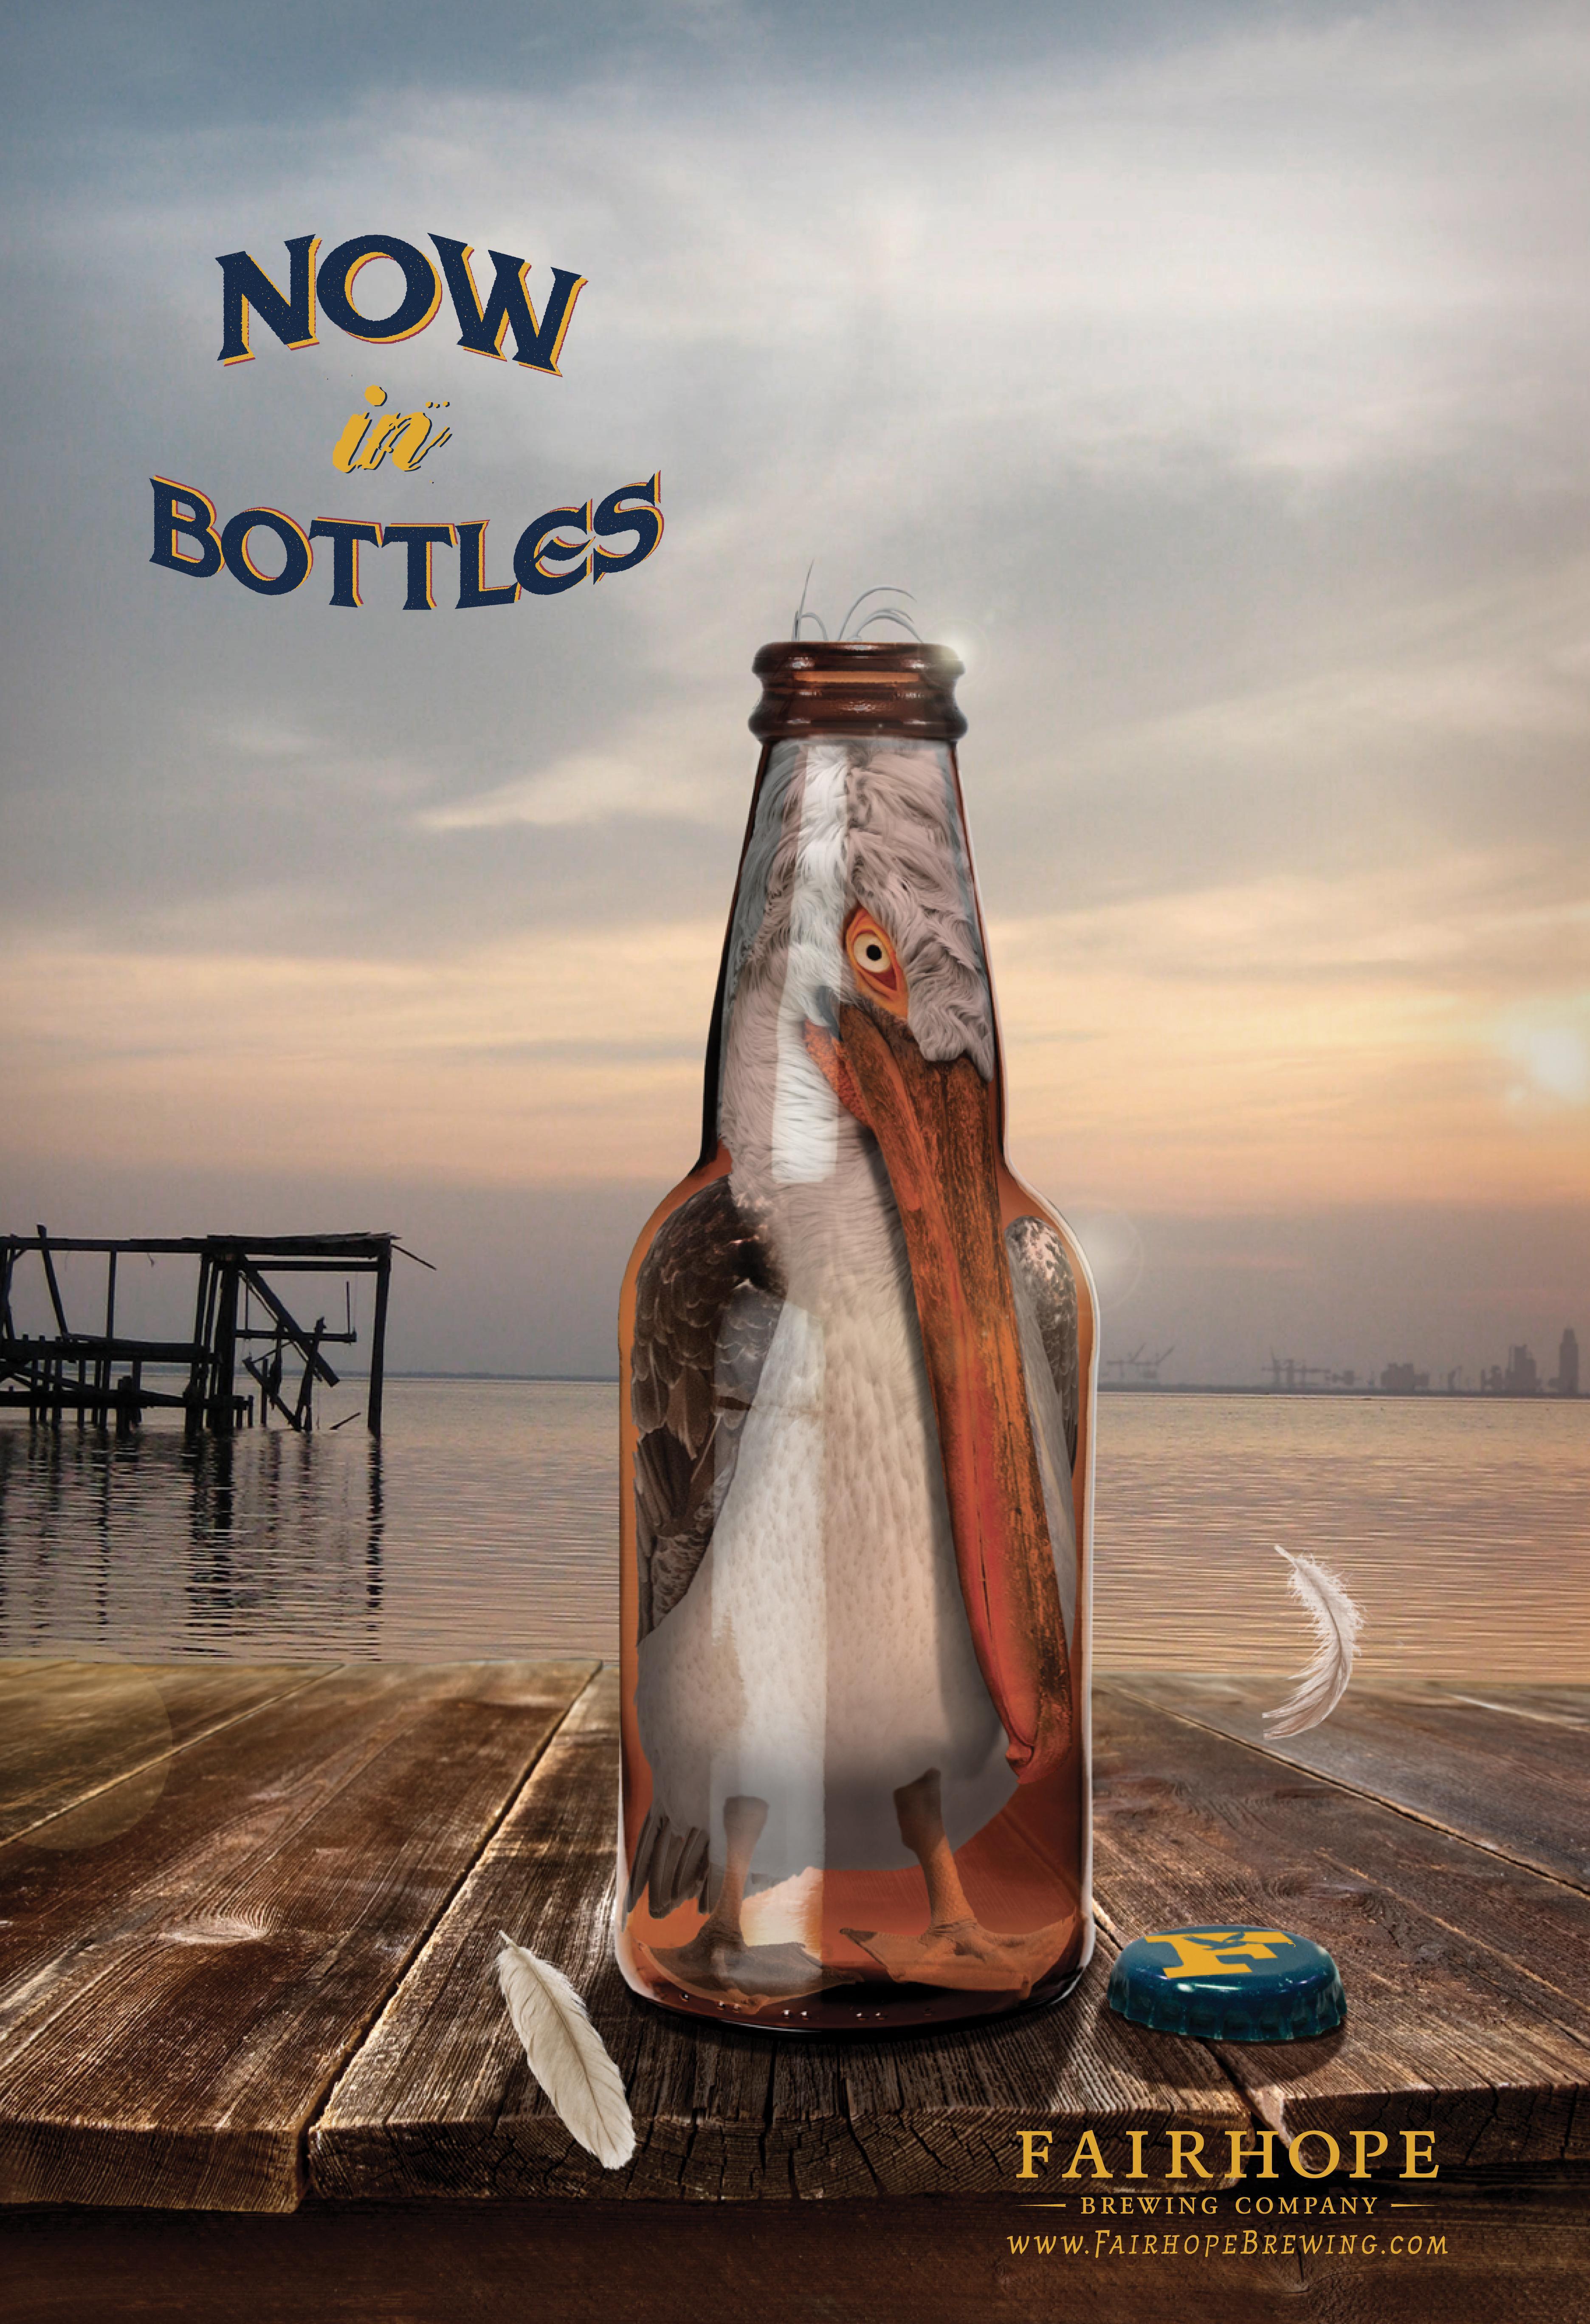 Fairhope Brewing Print Ad - Now in bottles